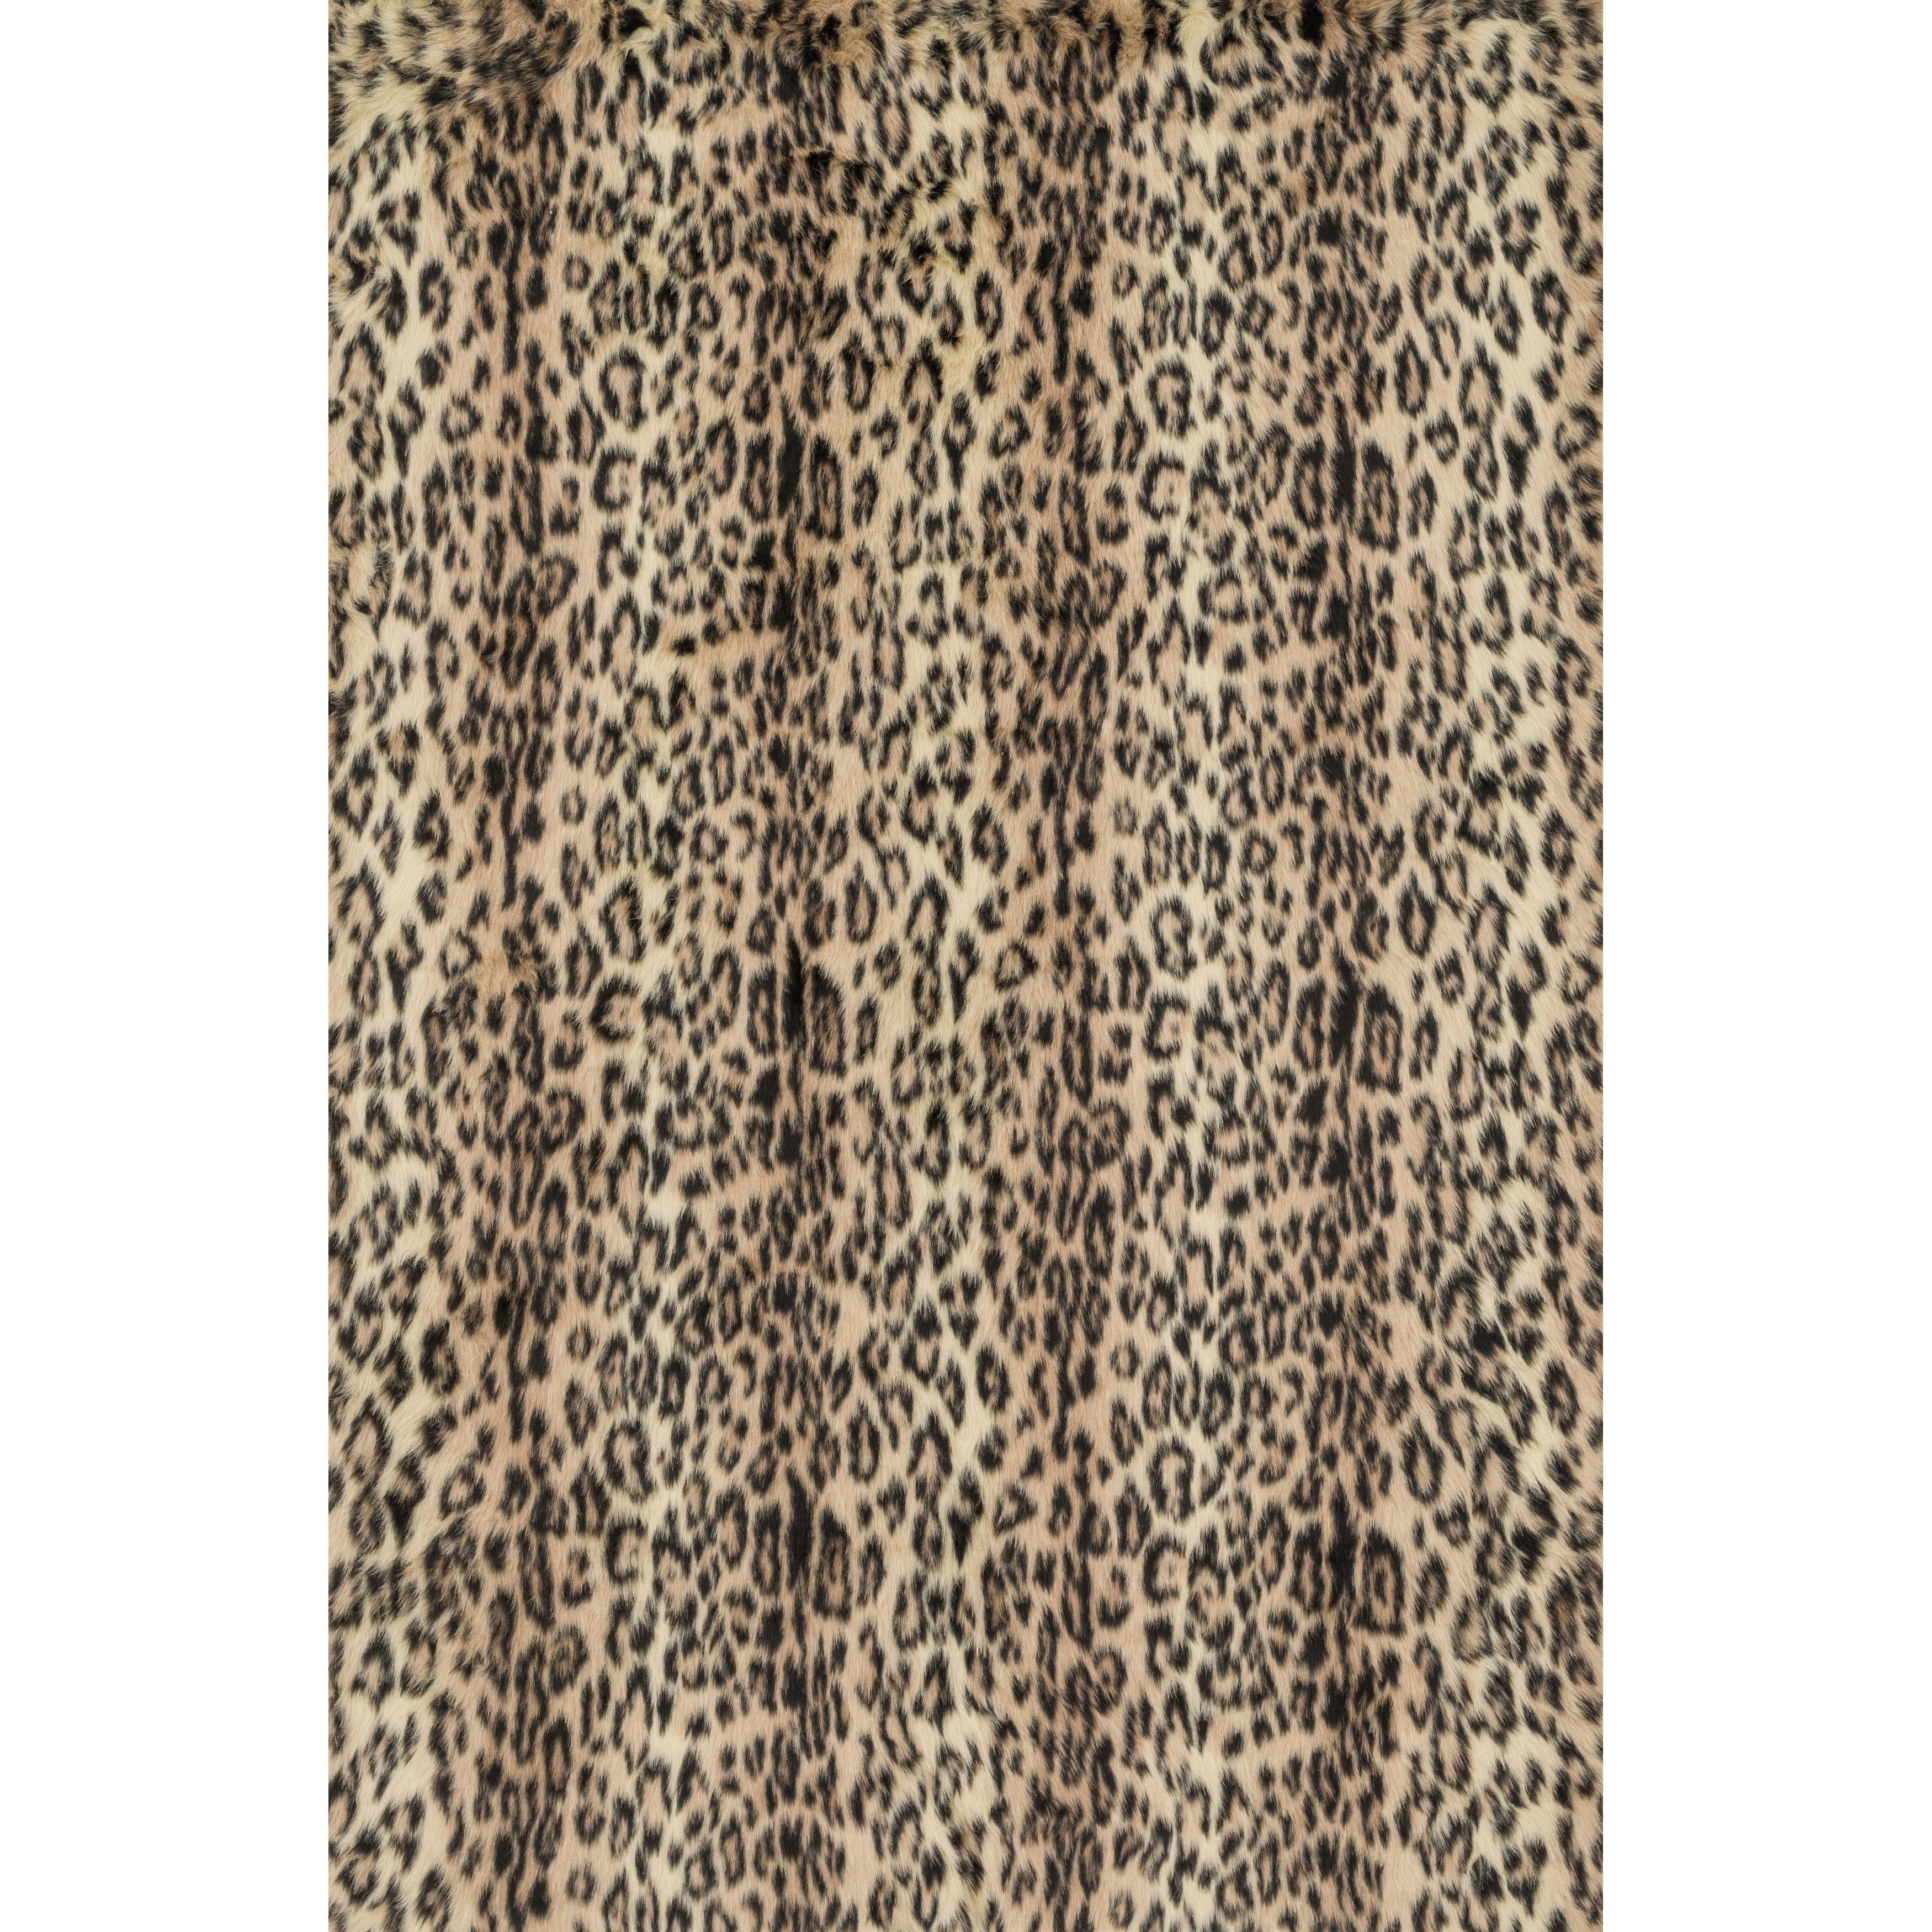 Alexander Home Jungle Cheeta Print Rug (2' x 3'), Brown, ...